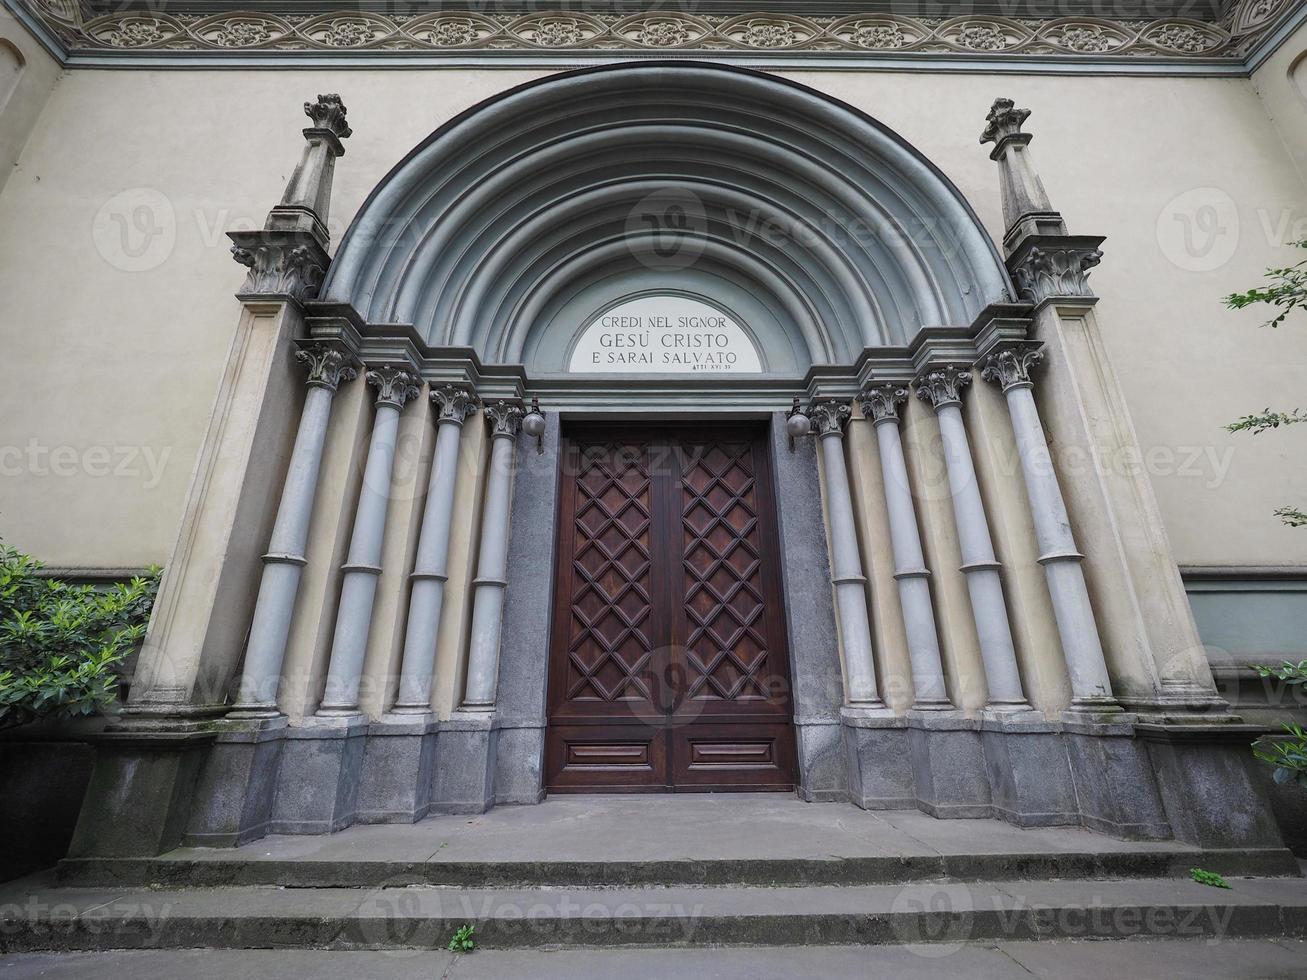 tempio valdese iglesia del templo valdense en turín foto